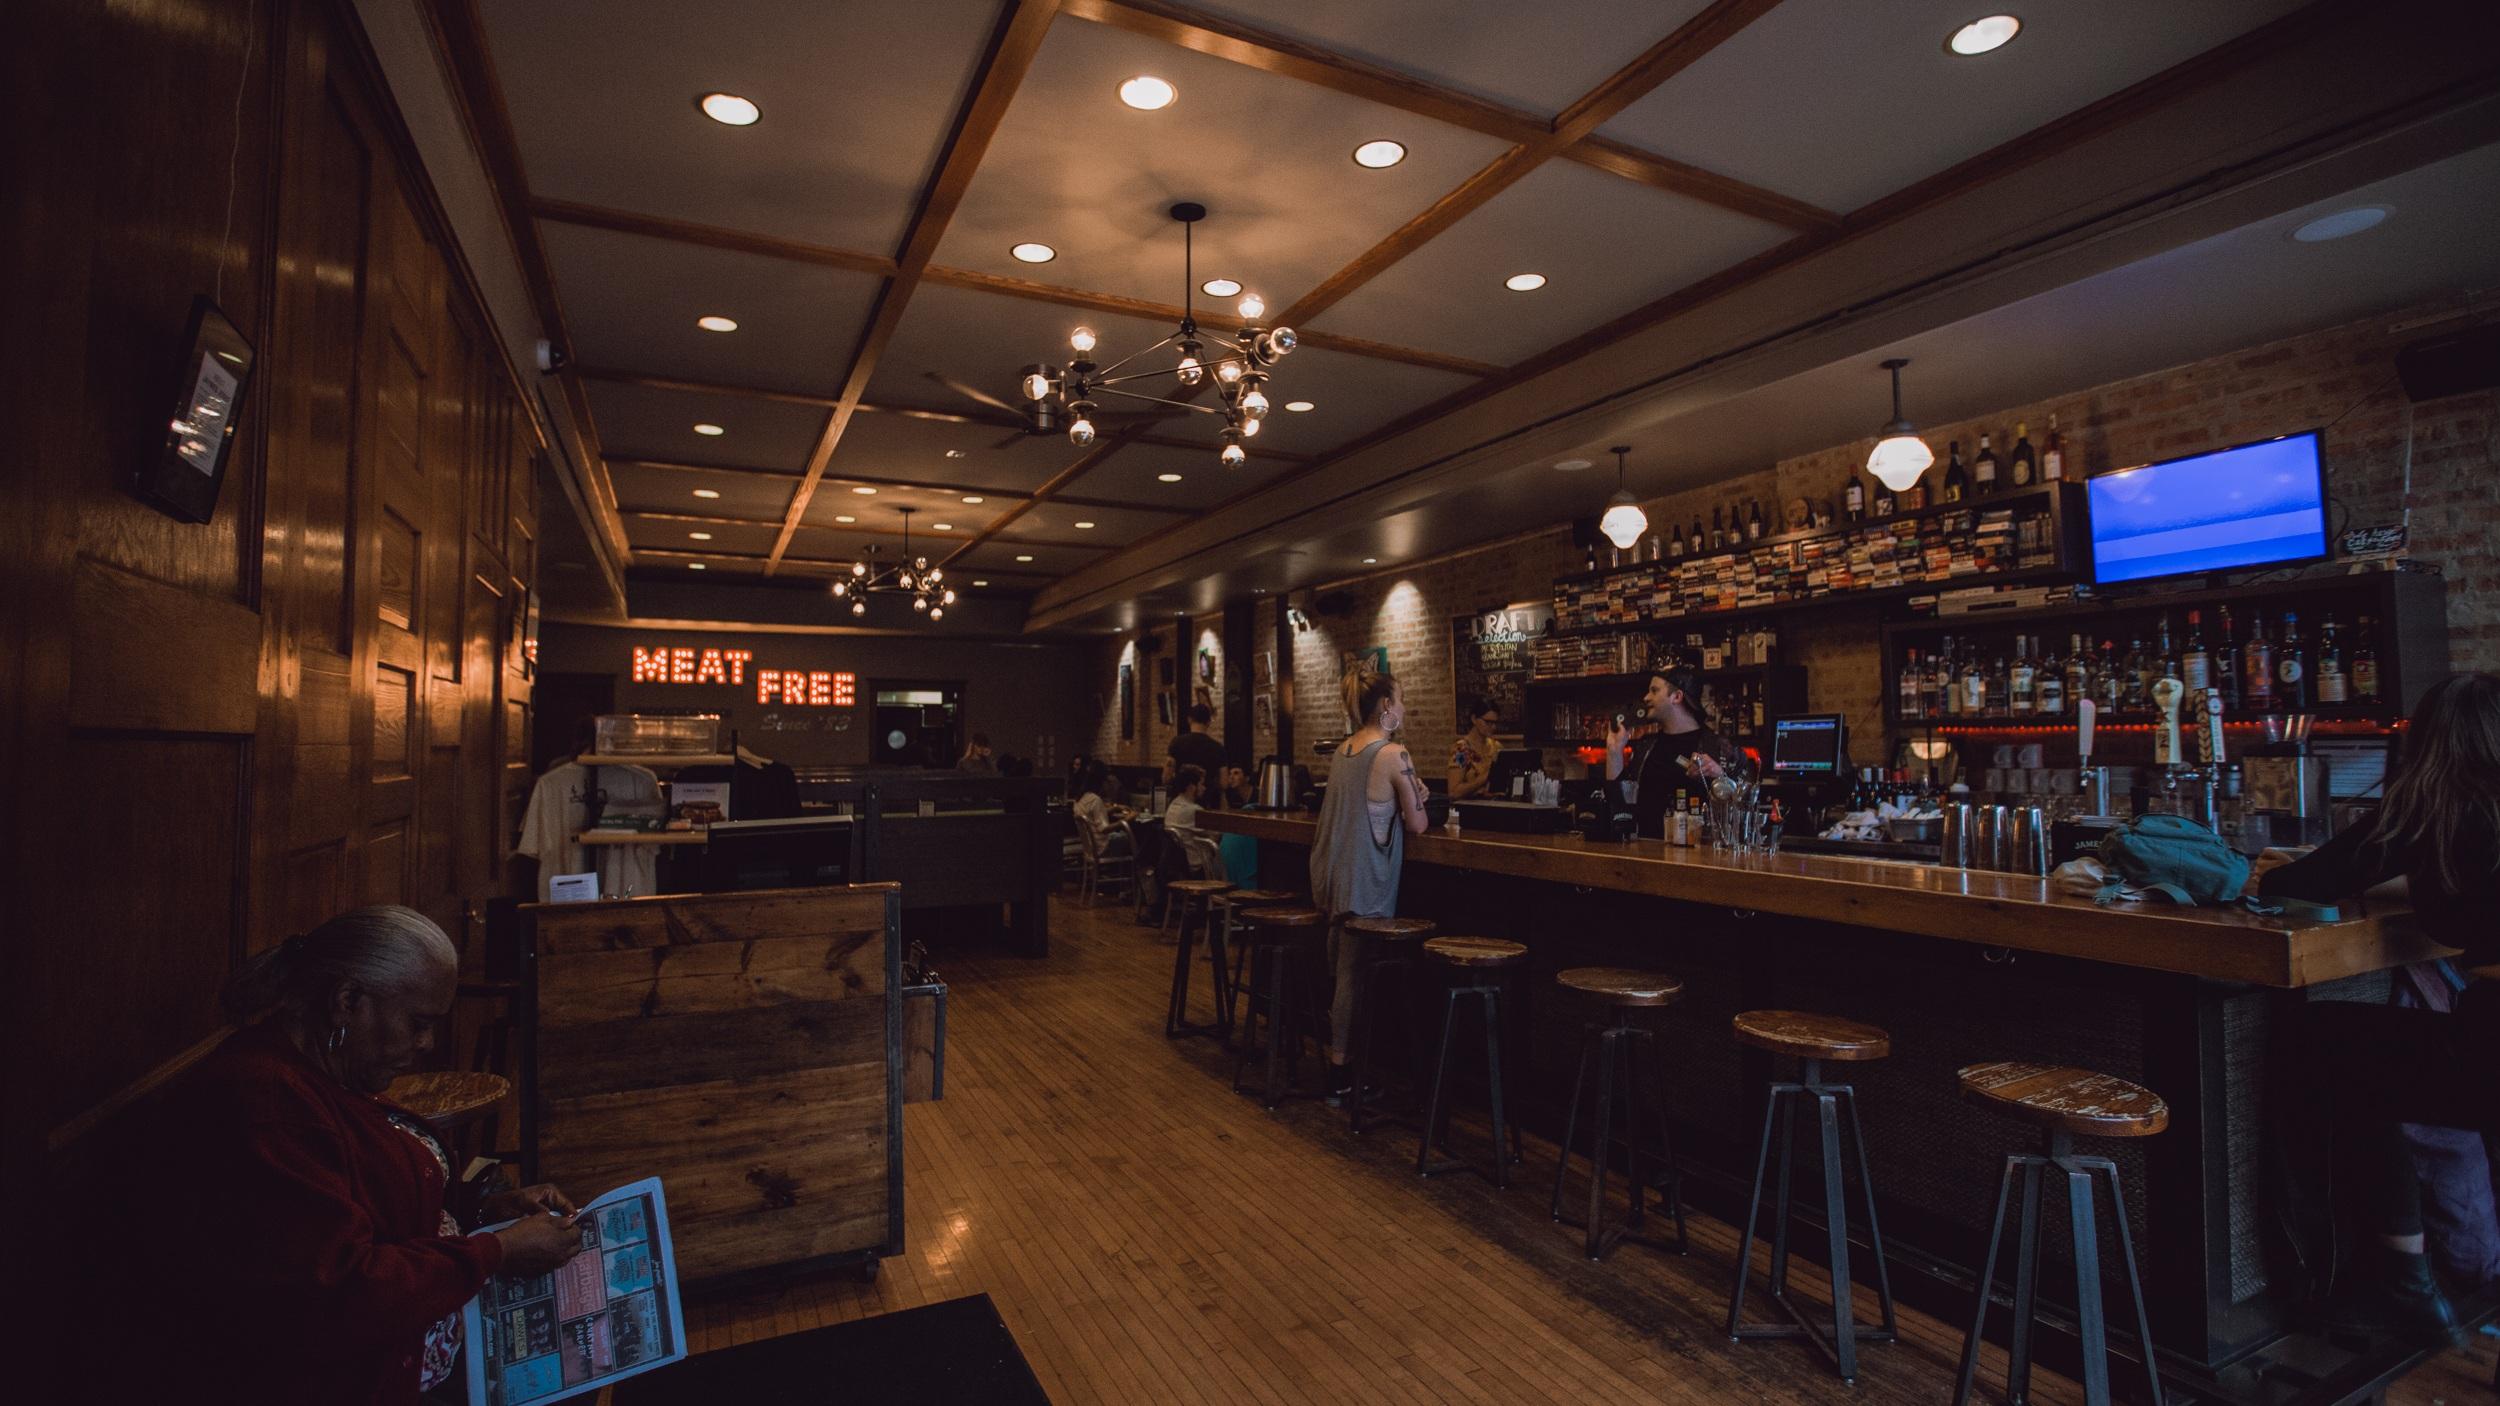 vegan+diner+chicago%2C+Chicago+Restaurant%2C+the+chicago+diner%2C+meat+free+since+%2783%2C+french+fries+in+chicago%2C+putine+fries+in+chicago%2C+vegan+food+in+chicago-www.rachelsmak.com9.jpg